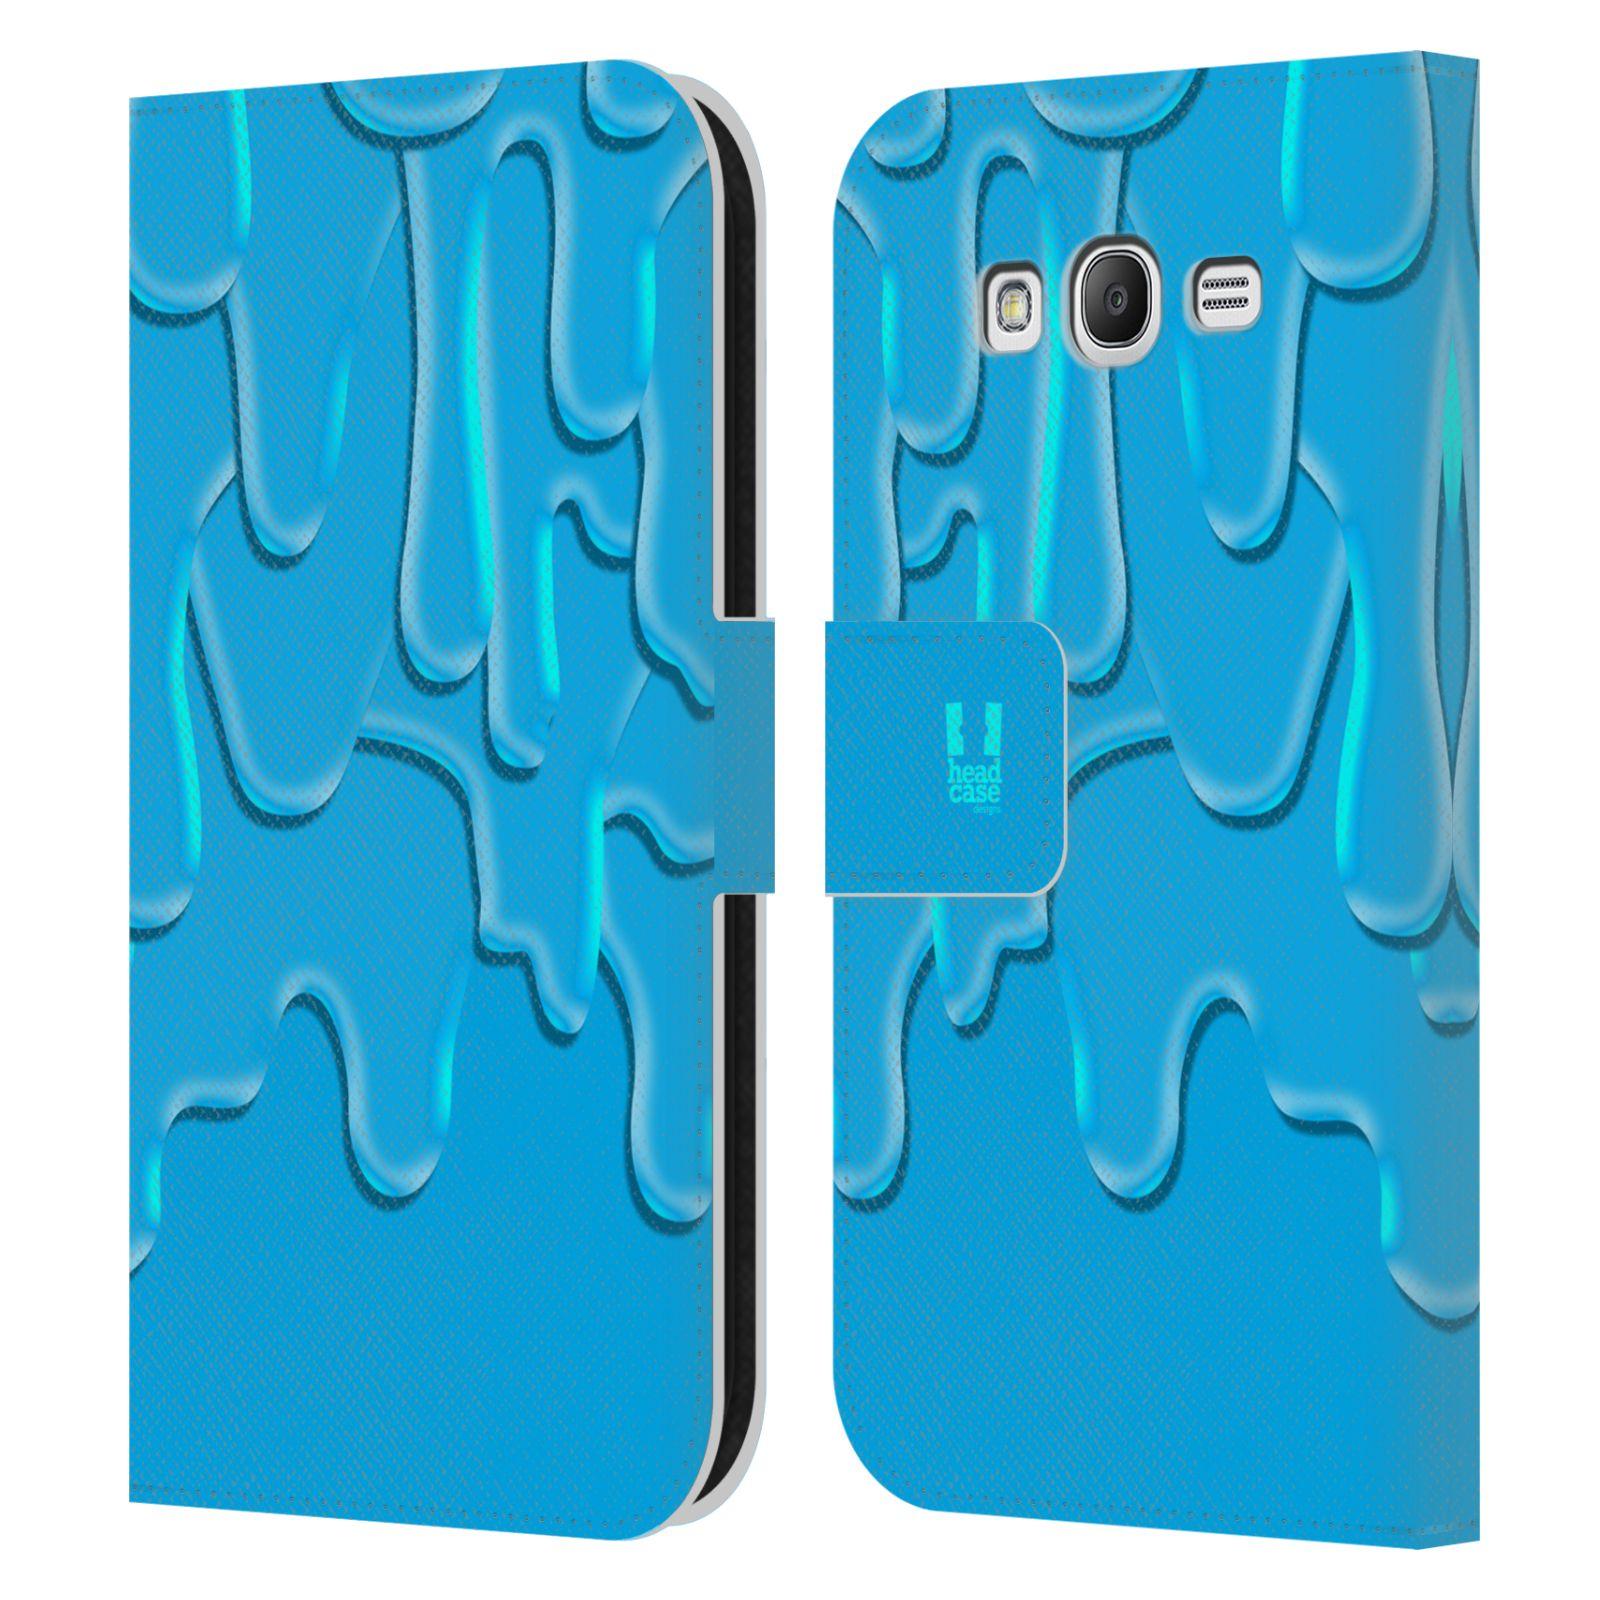 HEAD CASE Flipové pouzdro pro mobil Samsung Galaxy Grand i9080 ZÁPLAVA BARVA tyrkysová modrá